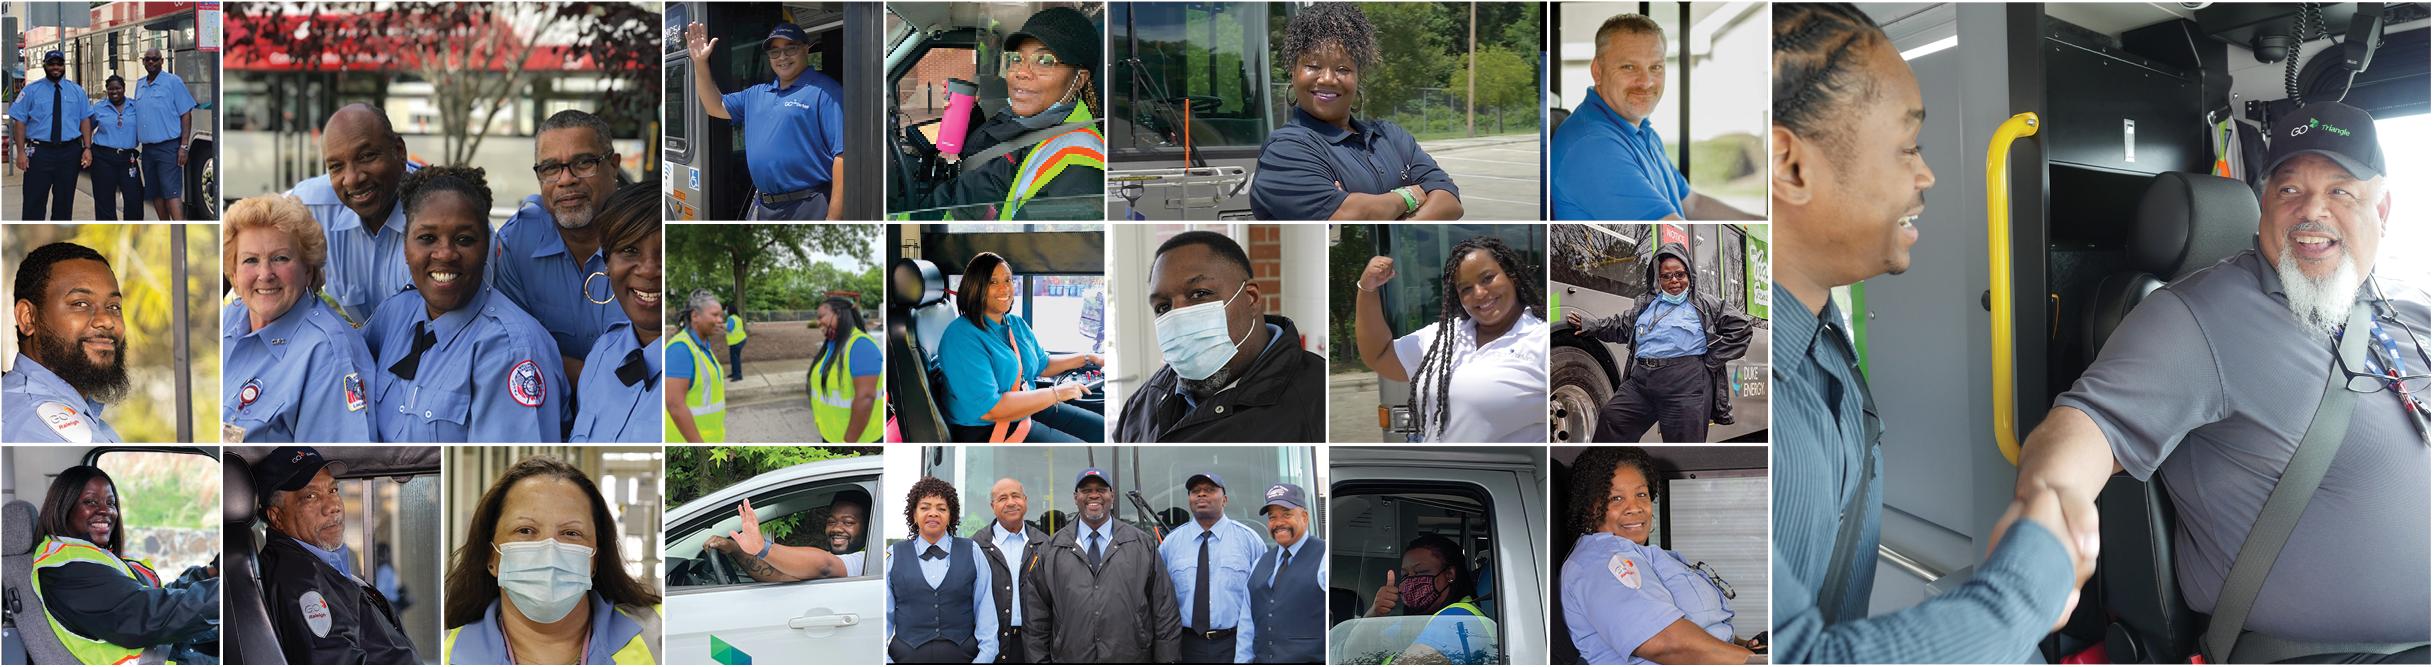 Transit Operators Collage